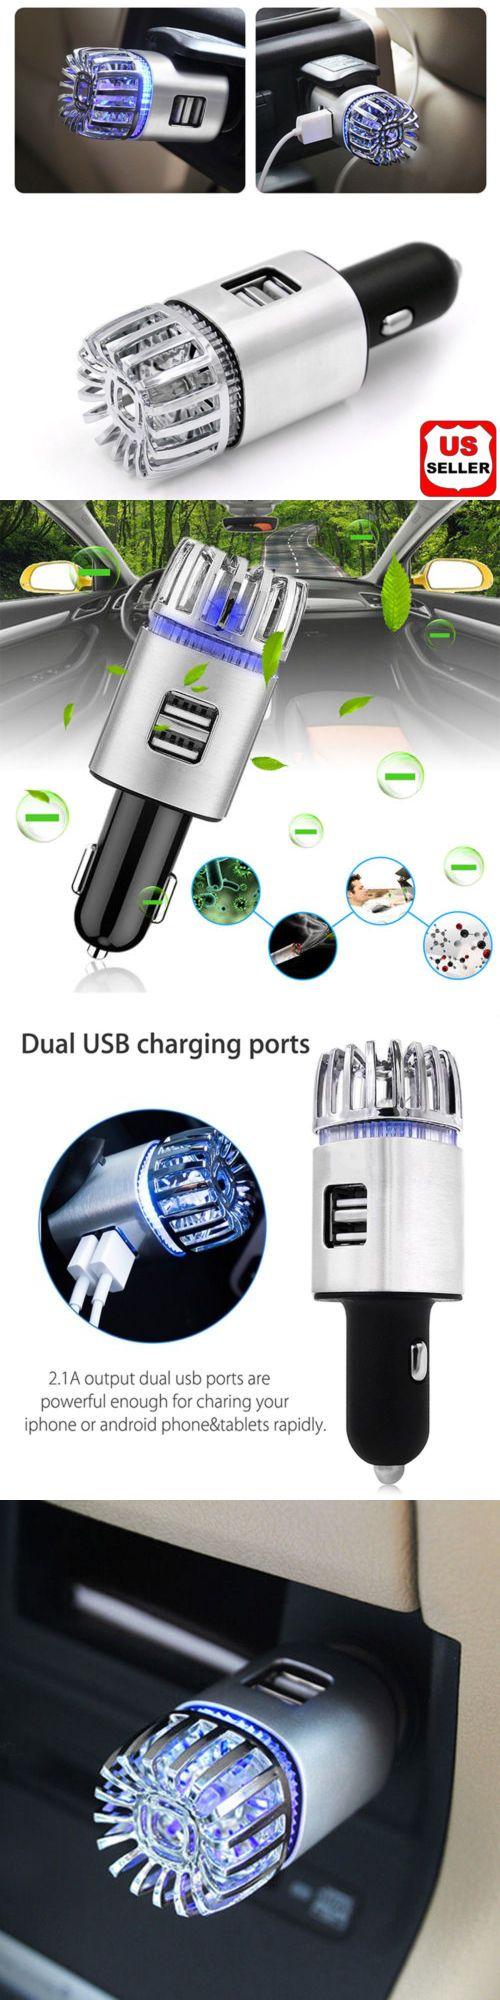 Details About 2 In 1 Car Dual Usb Fresh Air Ionic Purifier Oxygen Bar Ozone Ionizer Cleaner N1 Air Purifier Purifier